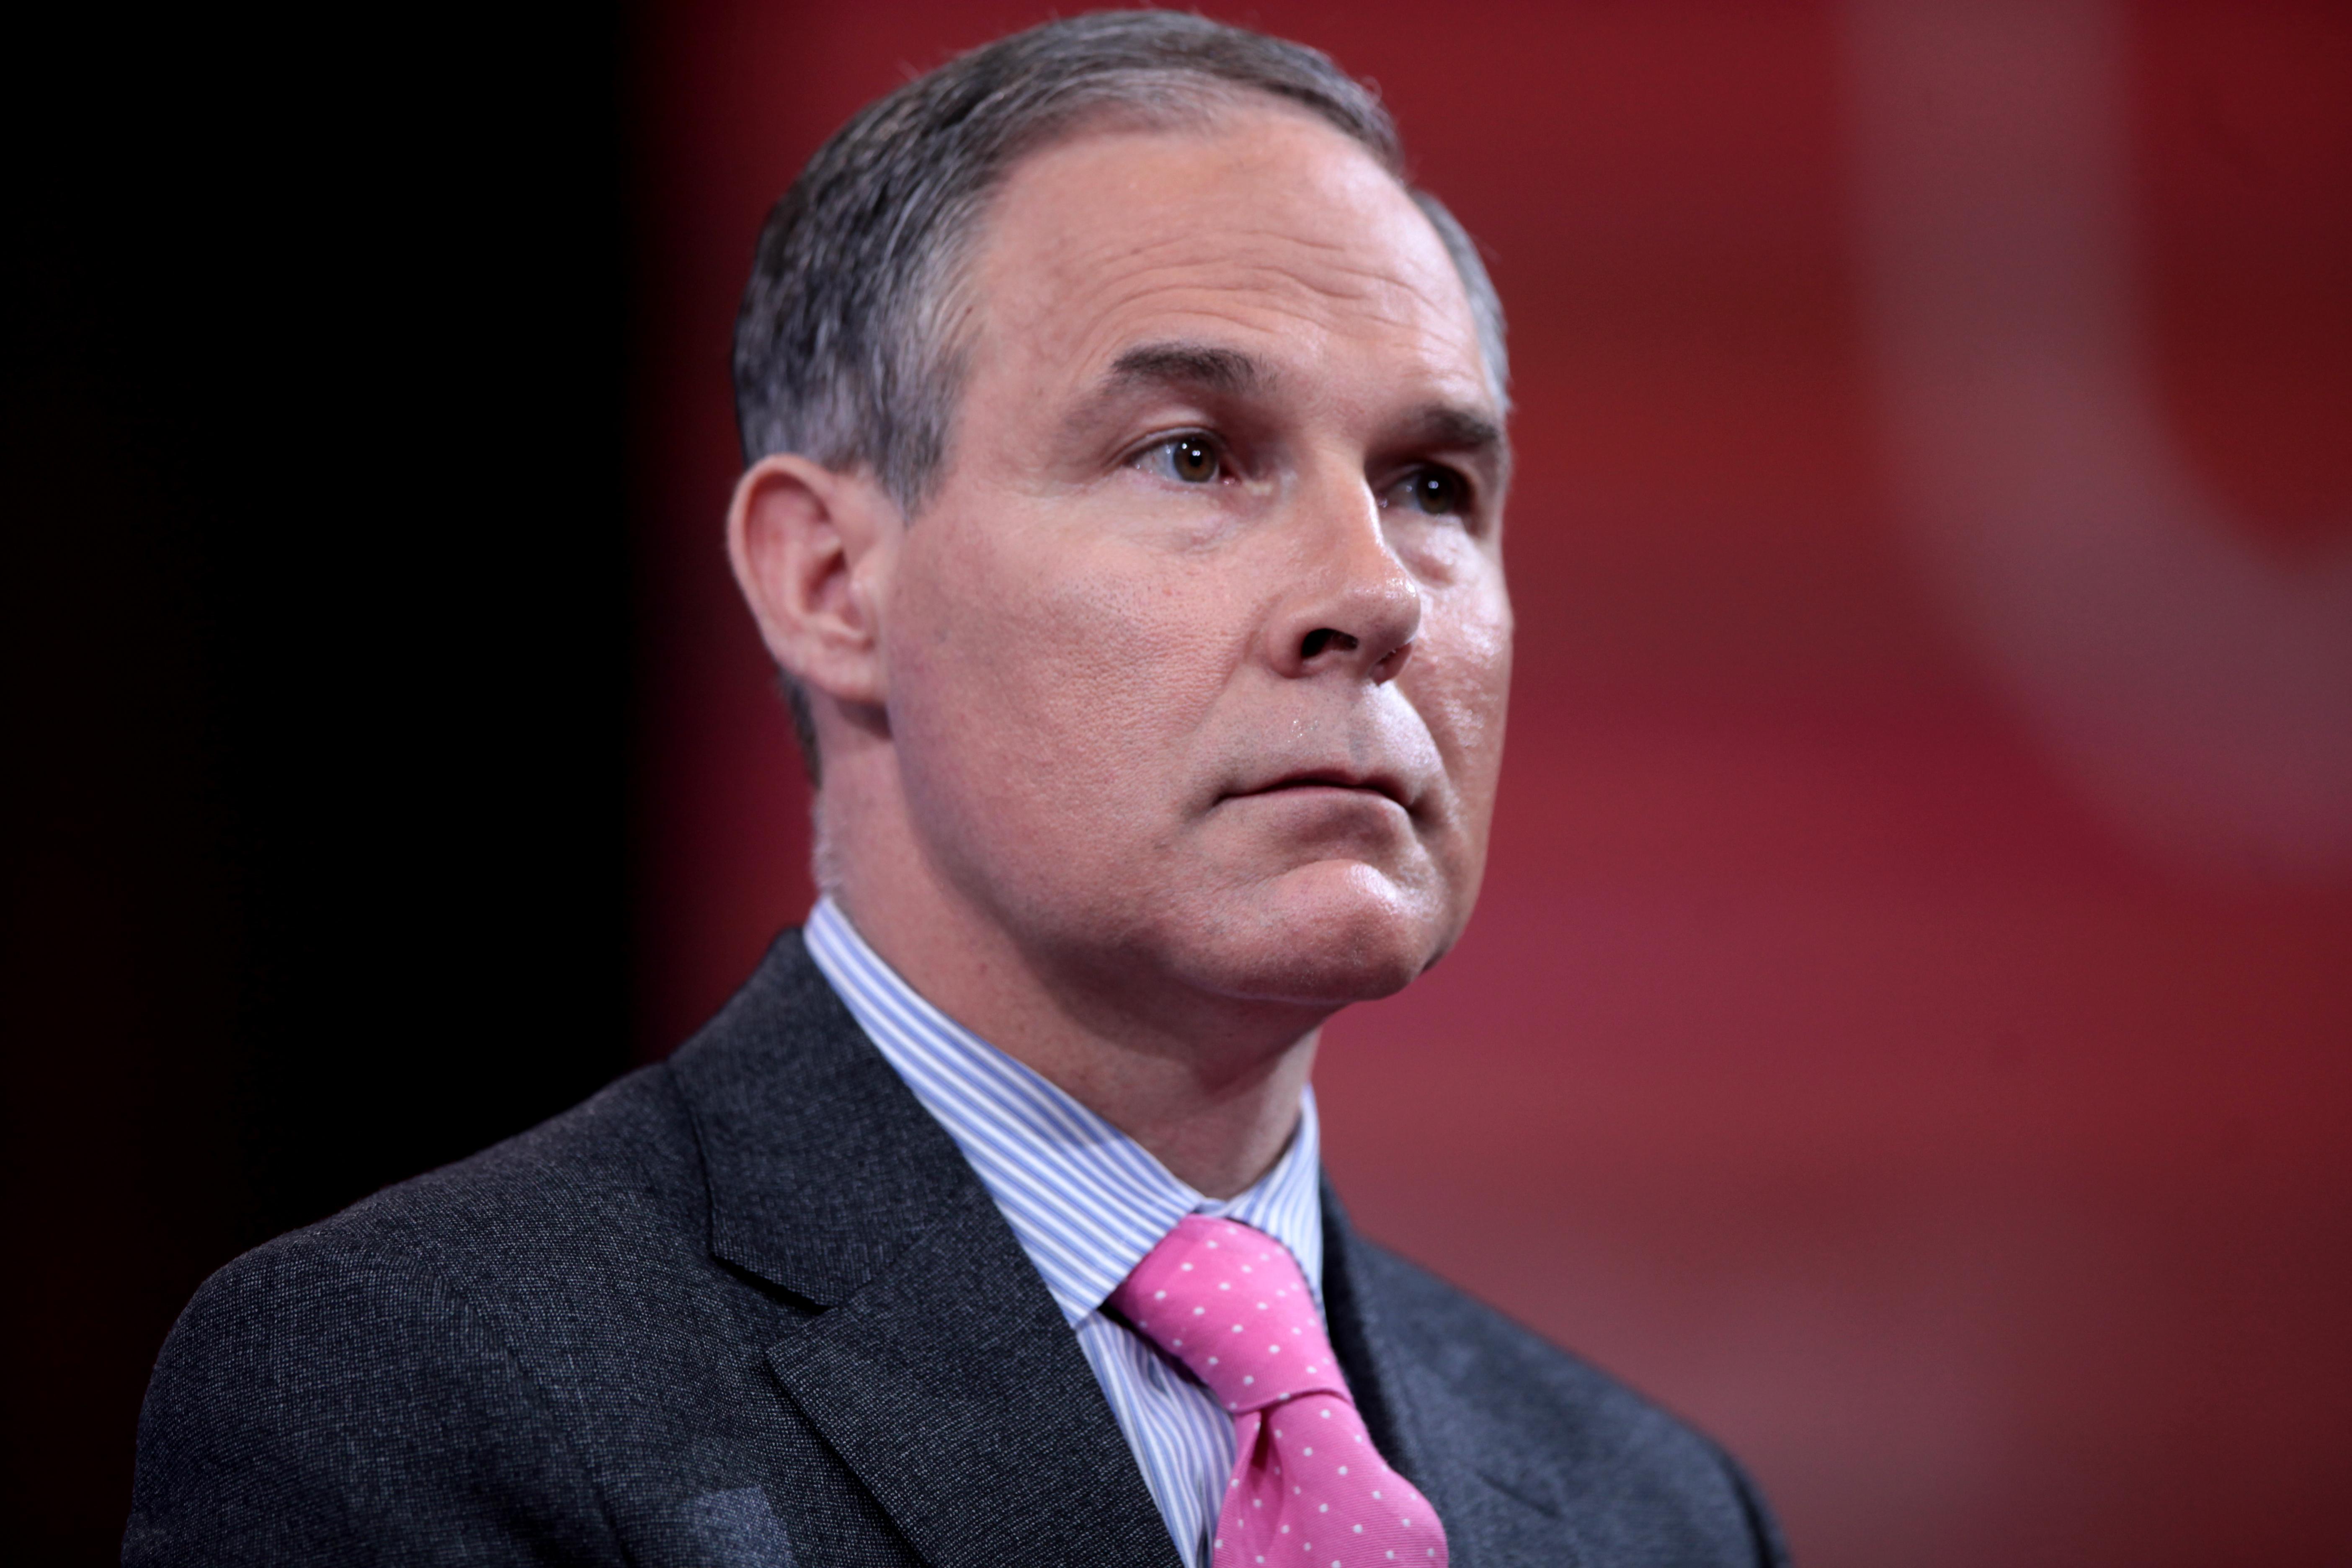 EPA chief Scott Pruitt announced the demise of the Clean Power Plan.